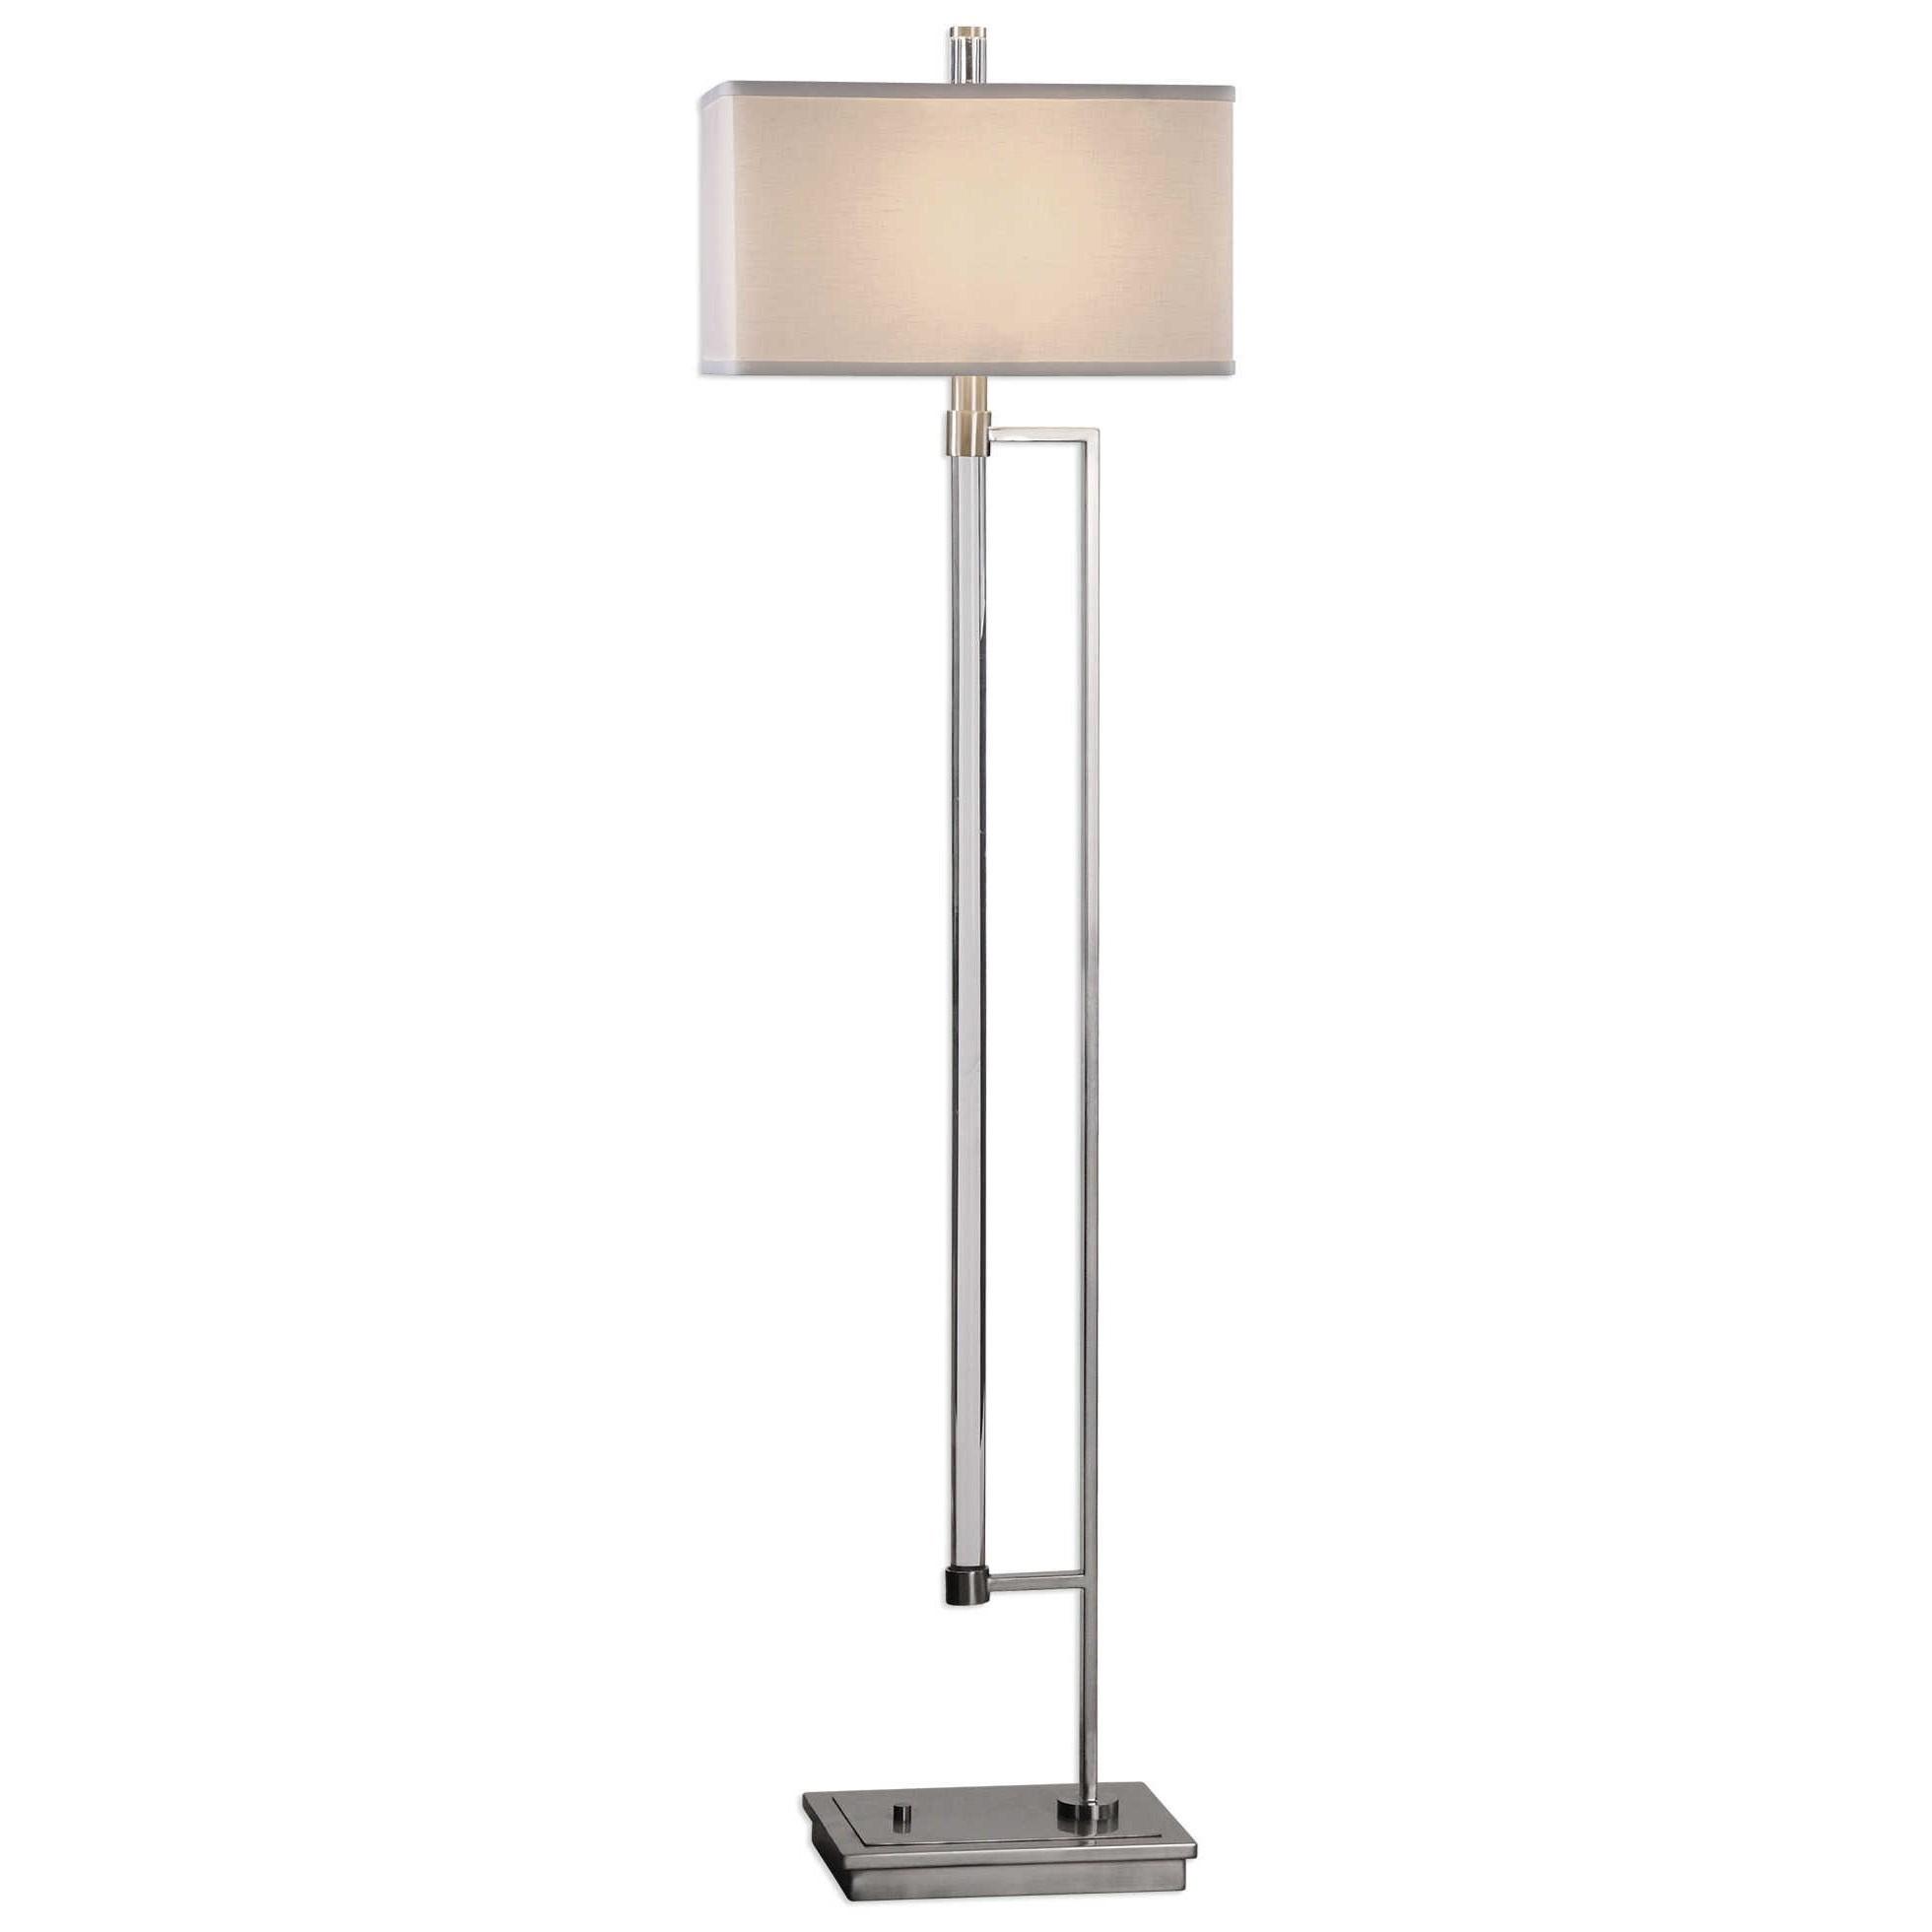 Floor Lamps Mannan Modern Floor Lamp by Uttermost at Mueller Furniture